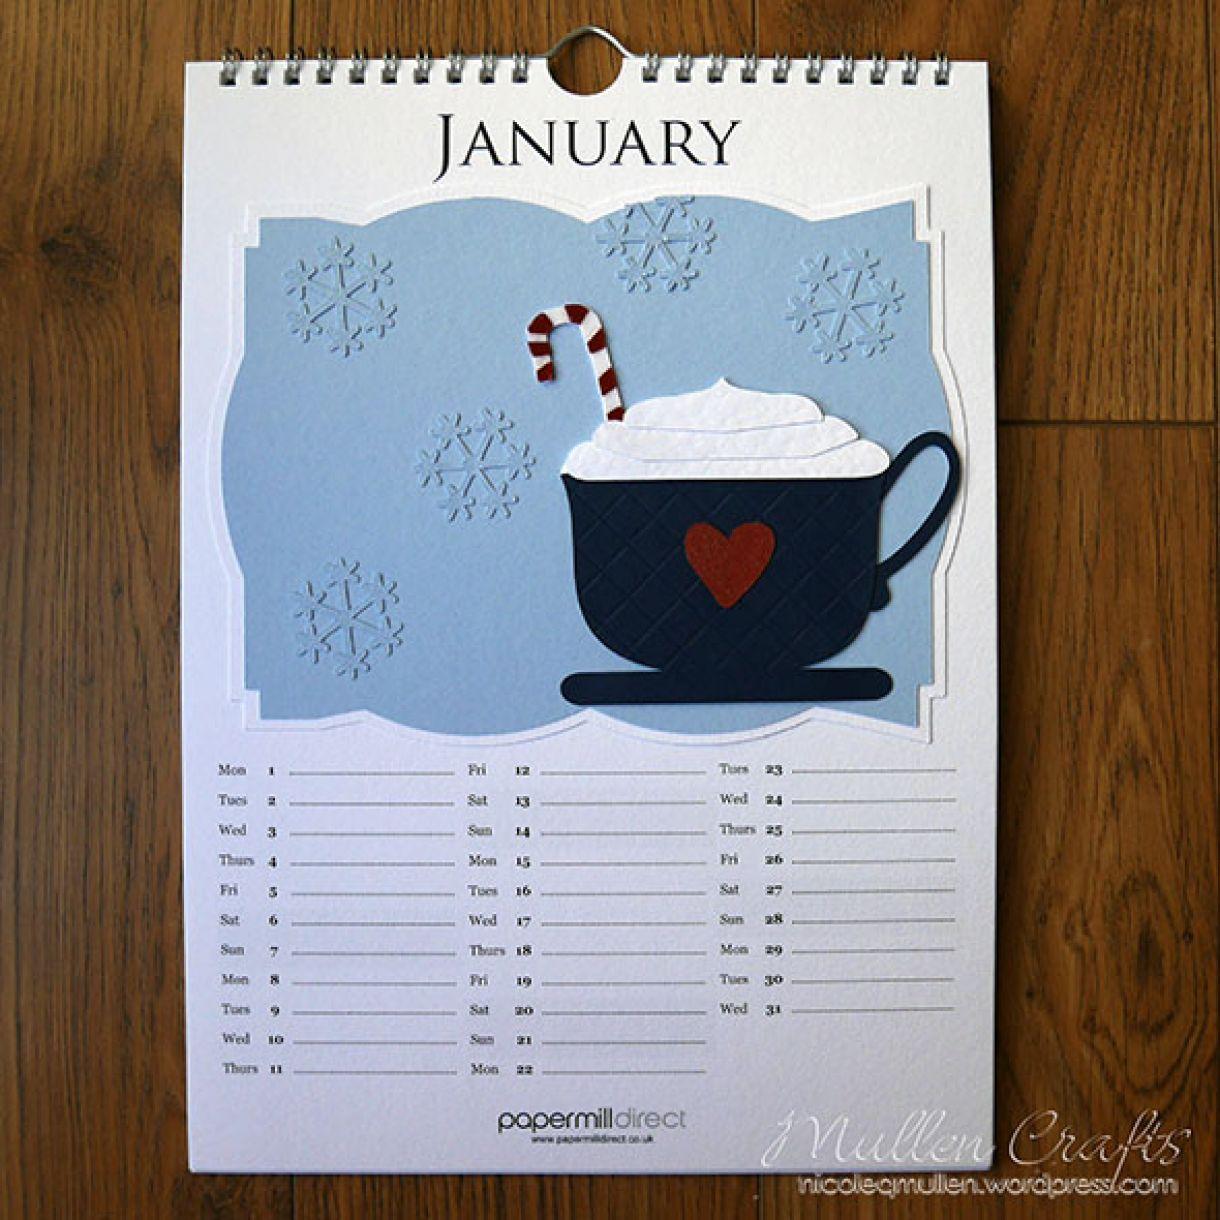 Nicole 2018 Calendar January 1